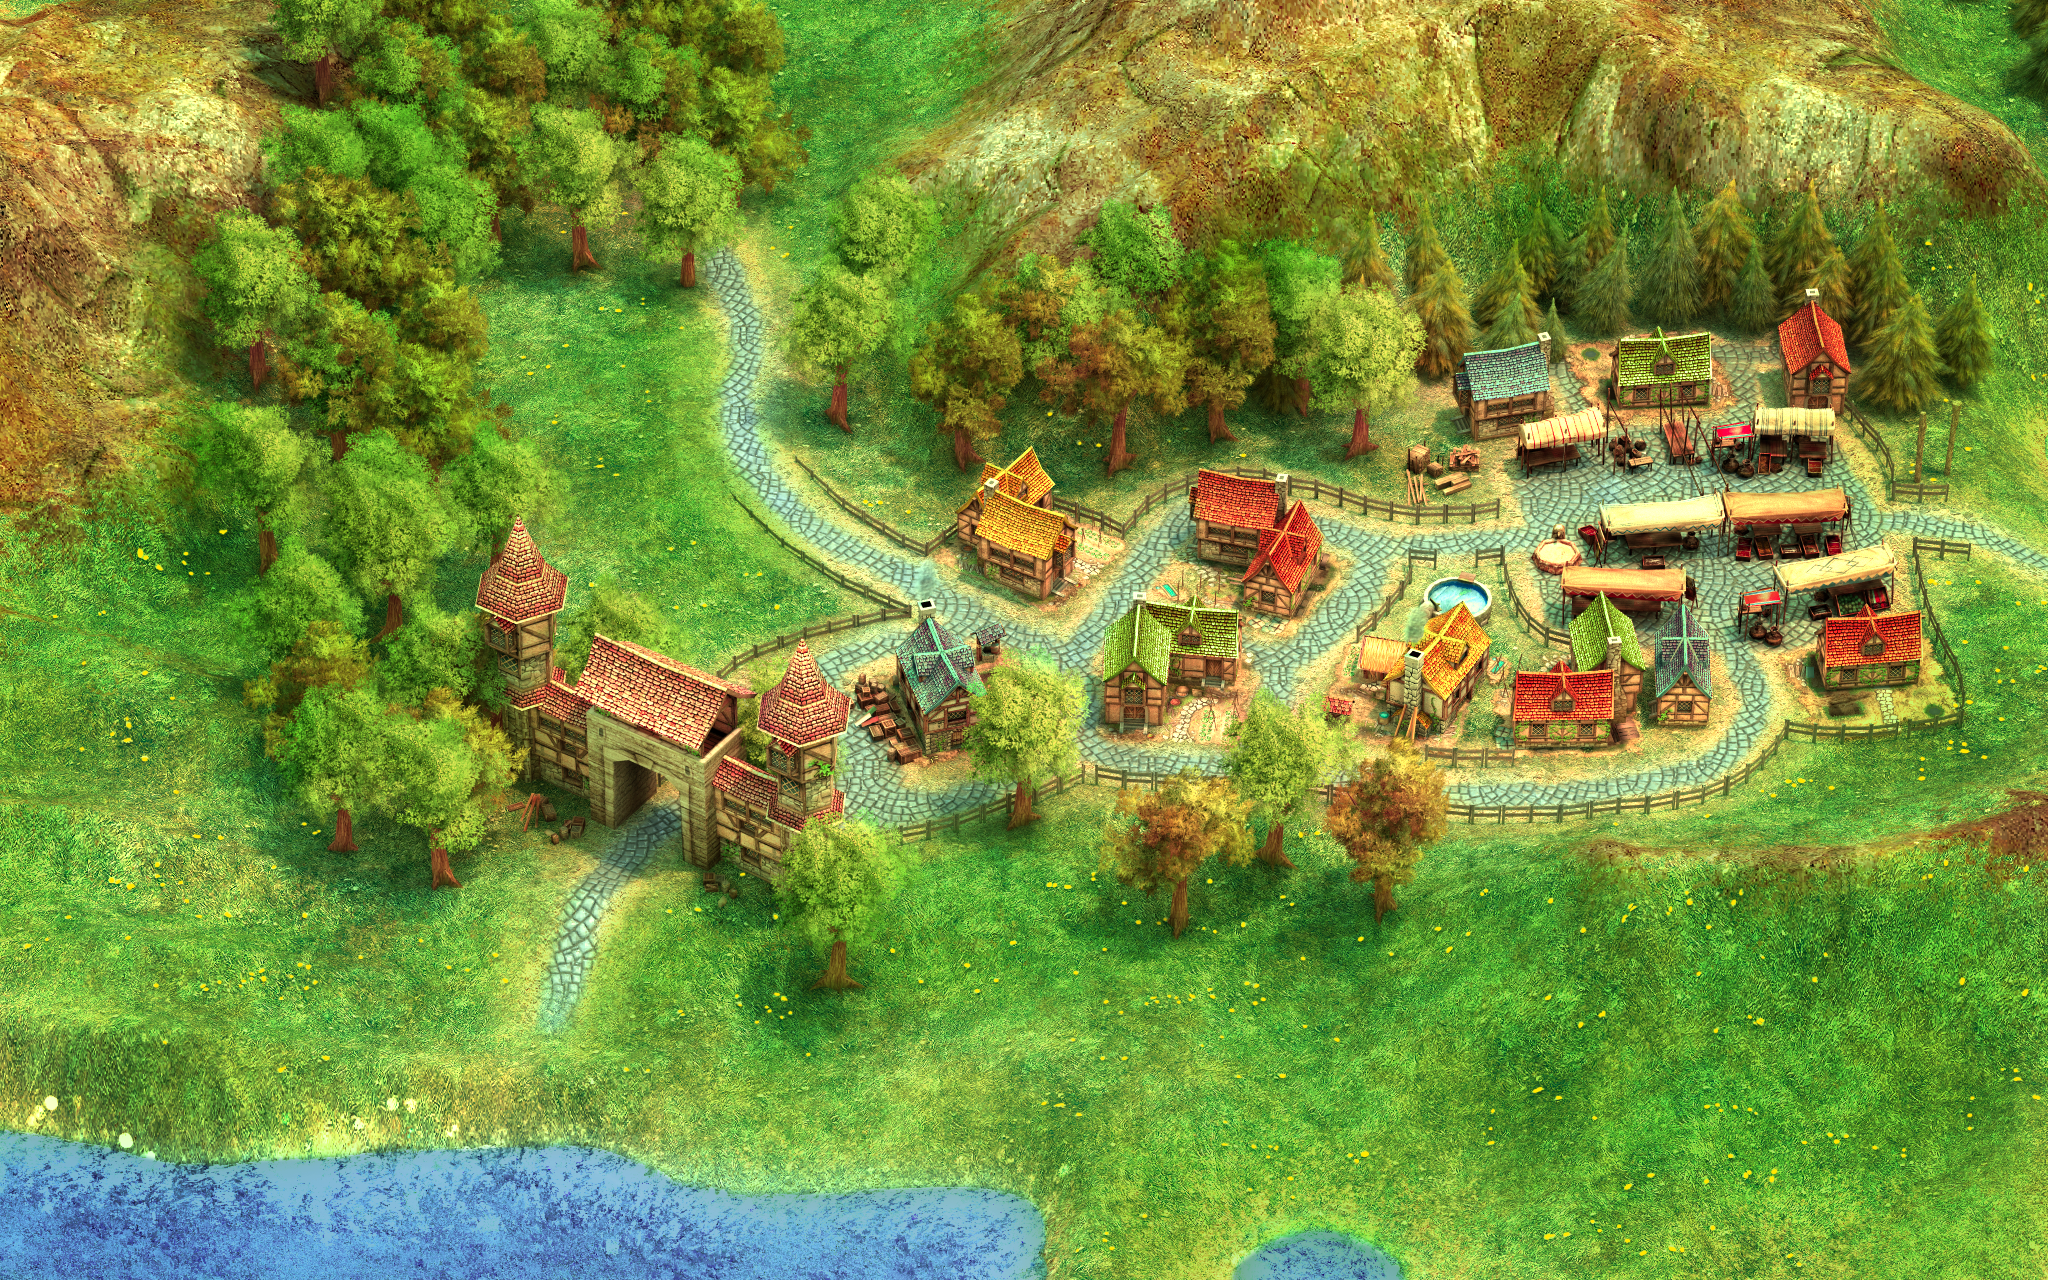 CG in Games